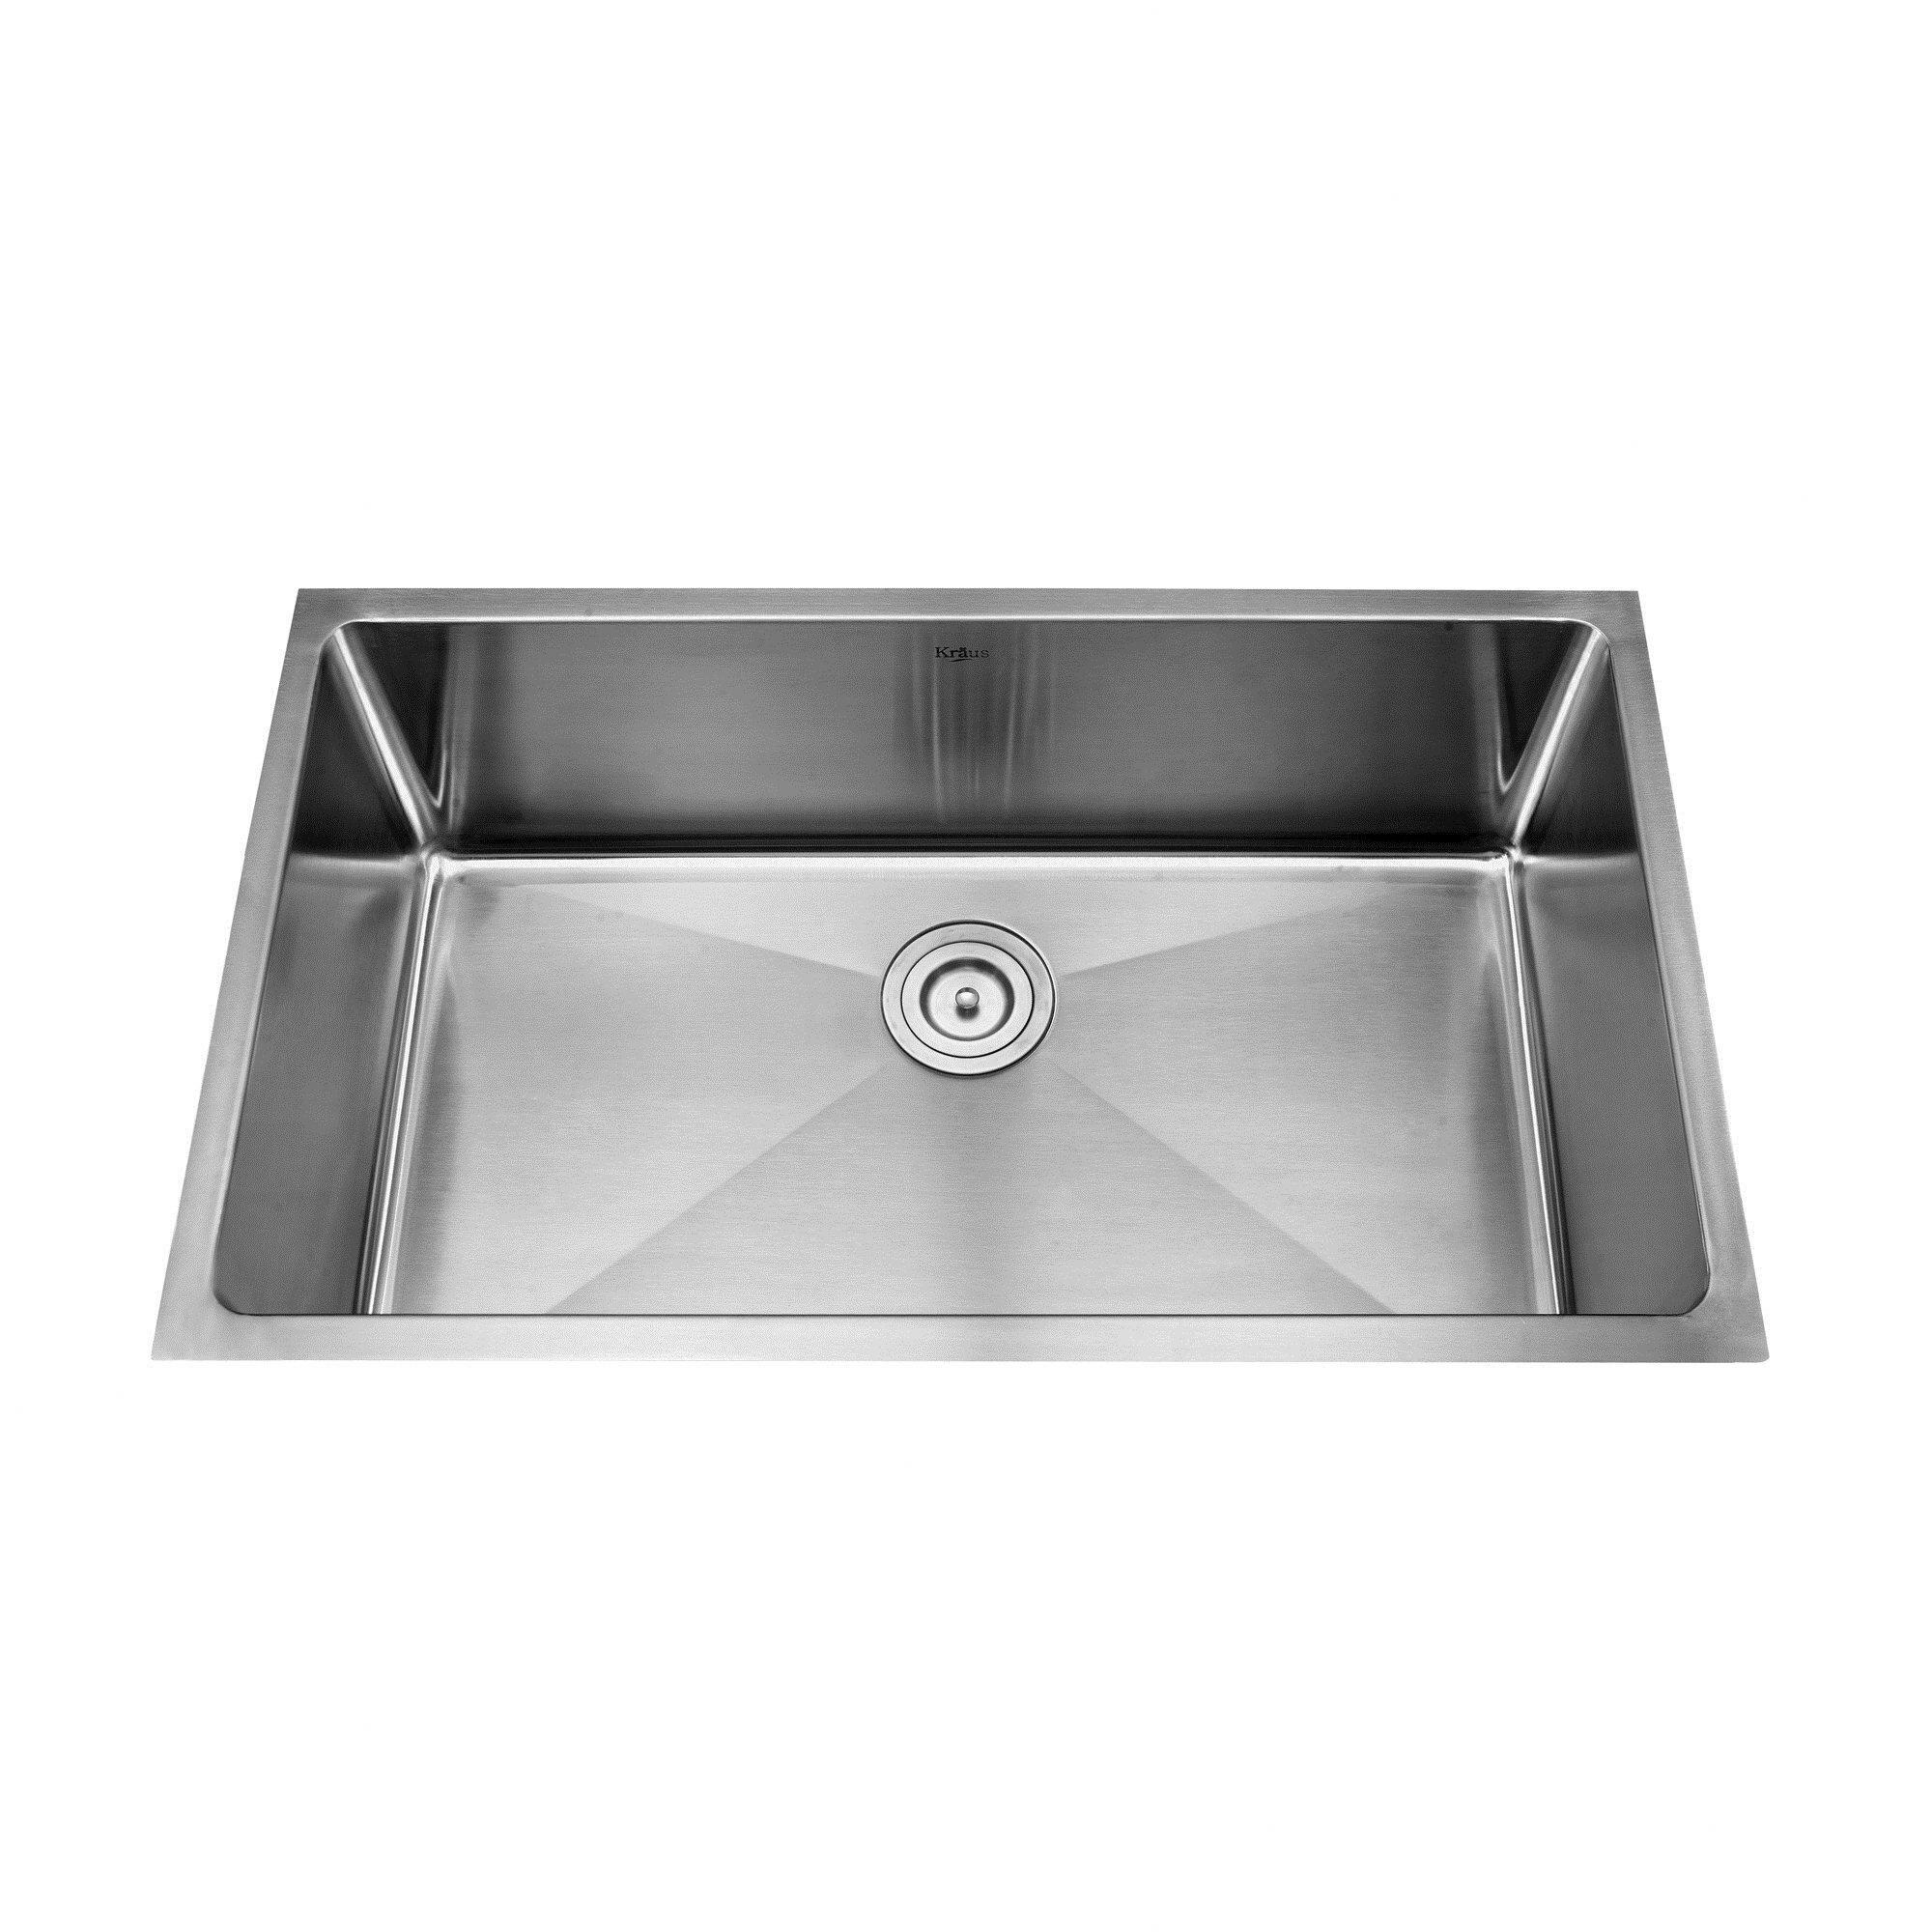 Kraus Kitchen Sink Reviews : Kraus 32